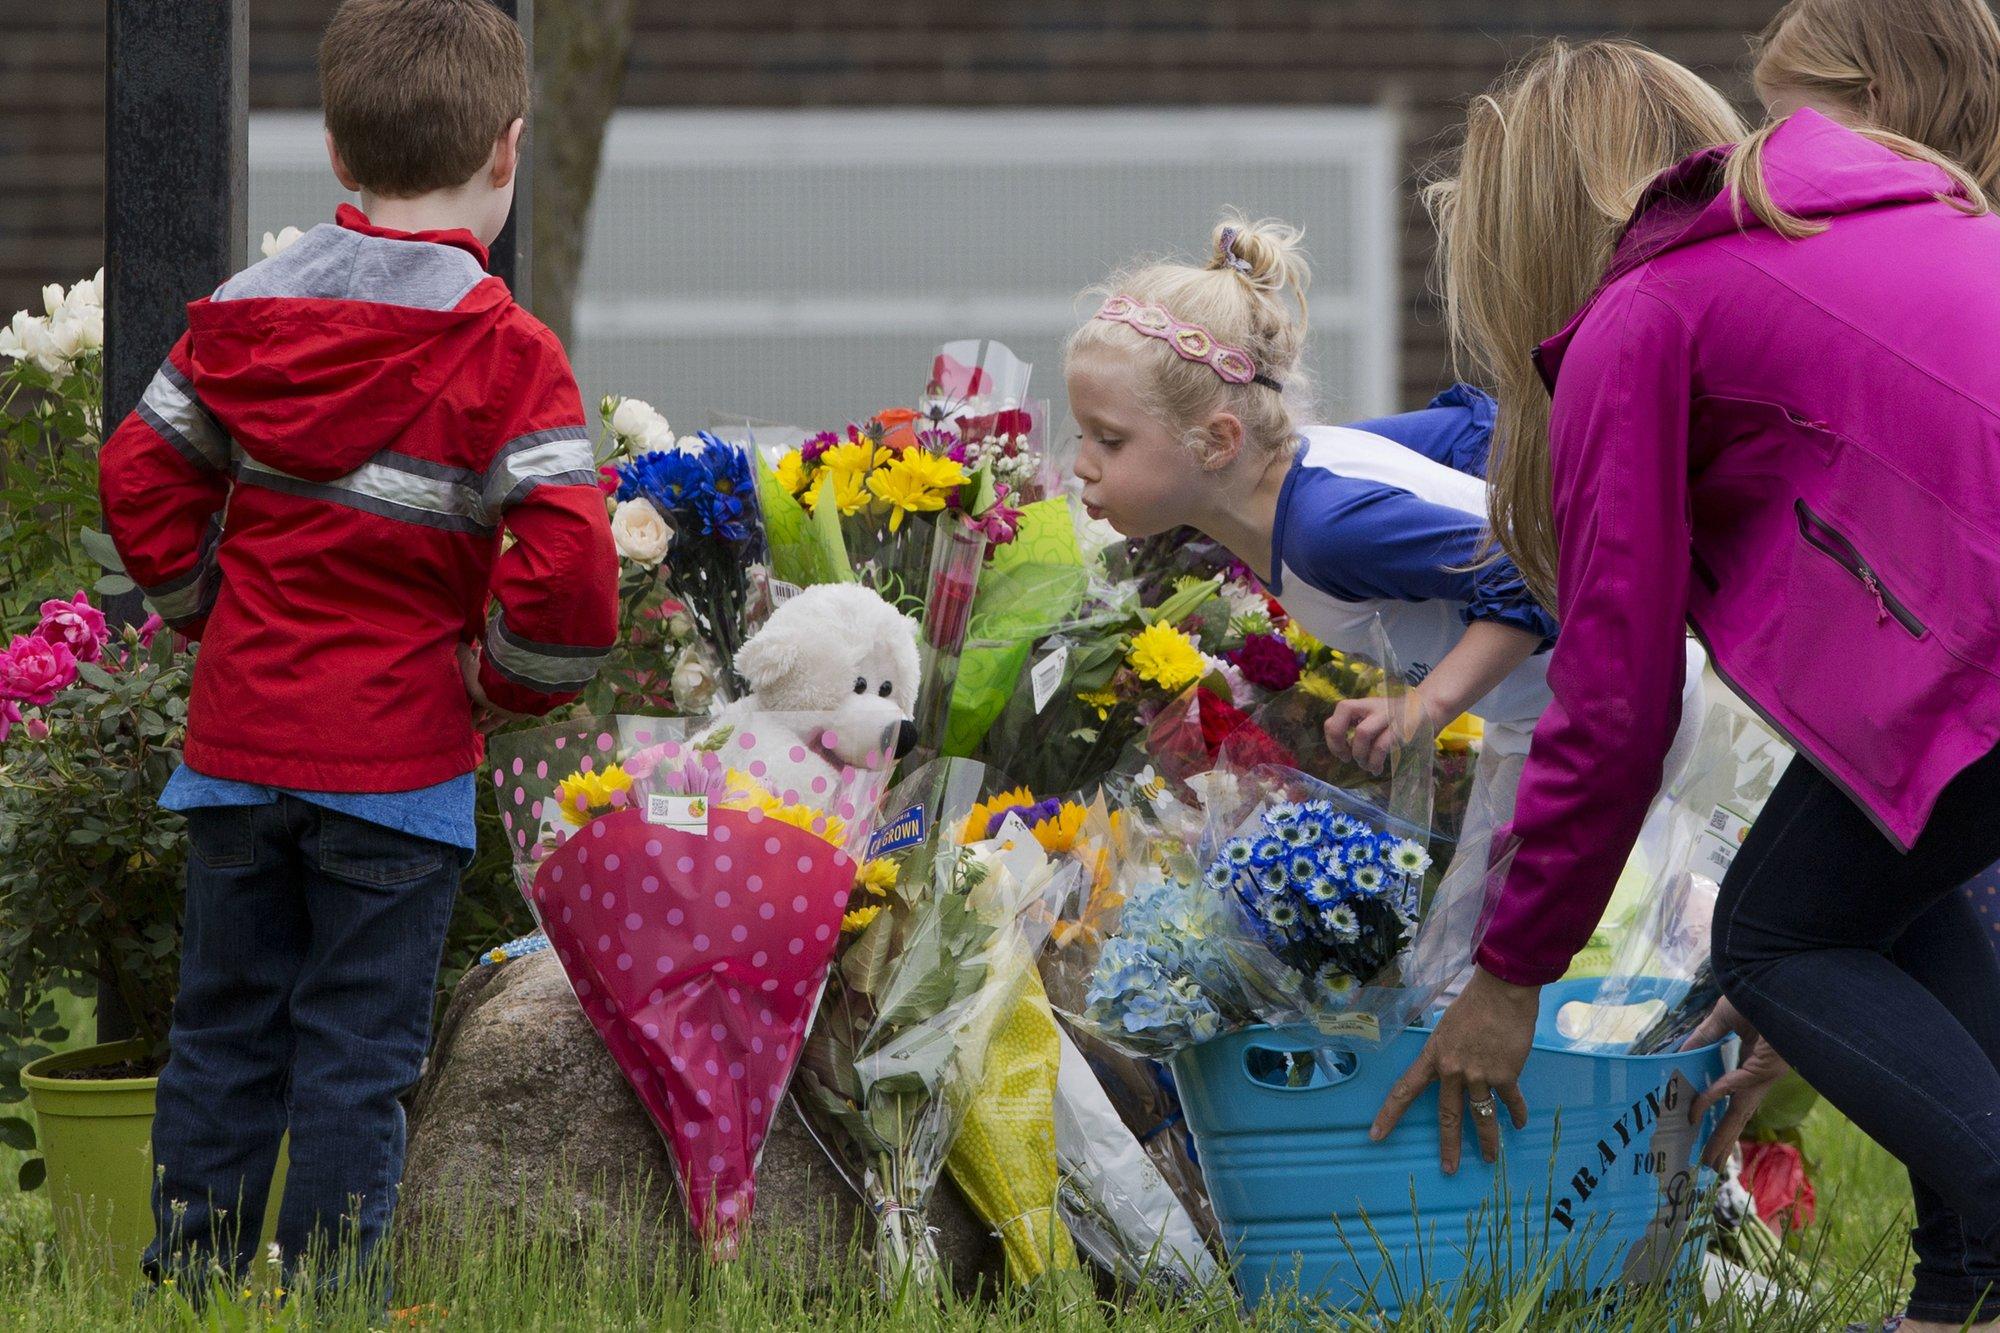 Funeral service held for girl killed in school bus crash izmirmasajfo